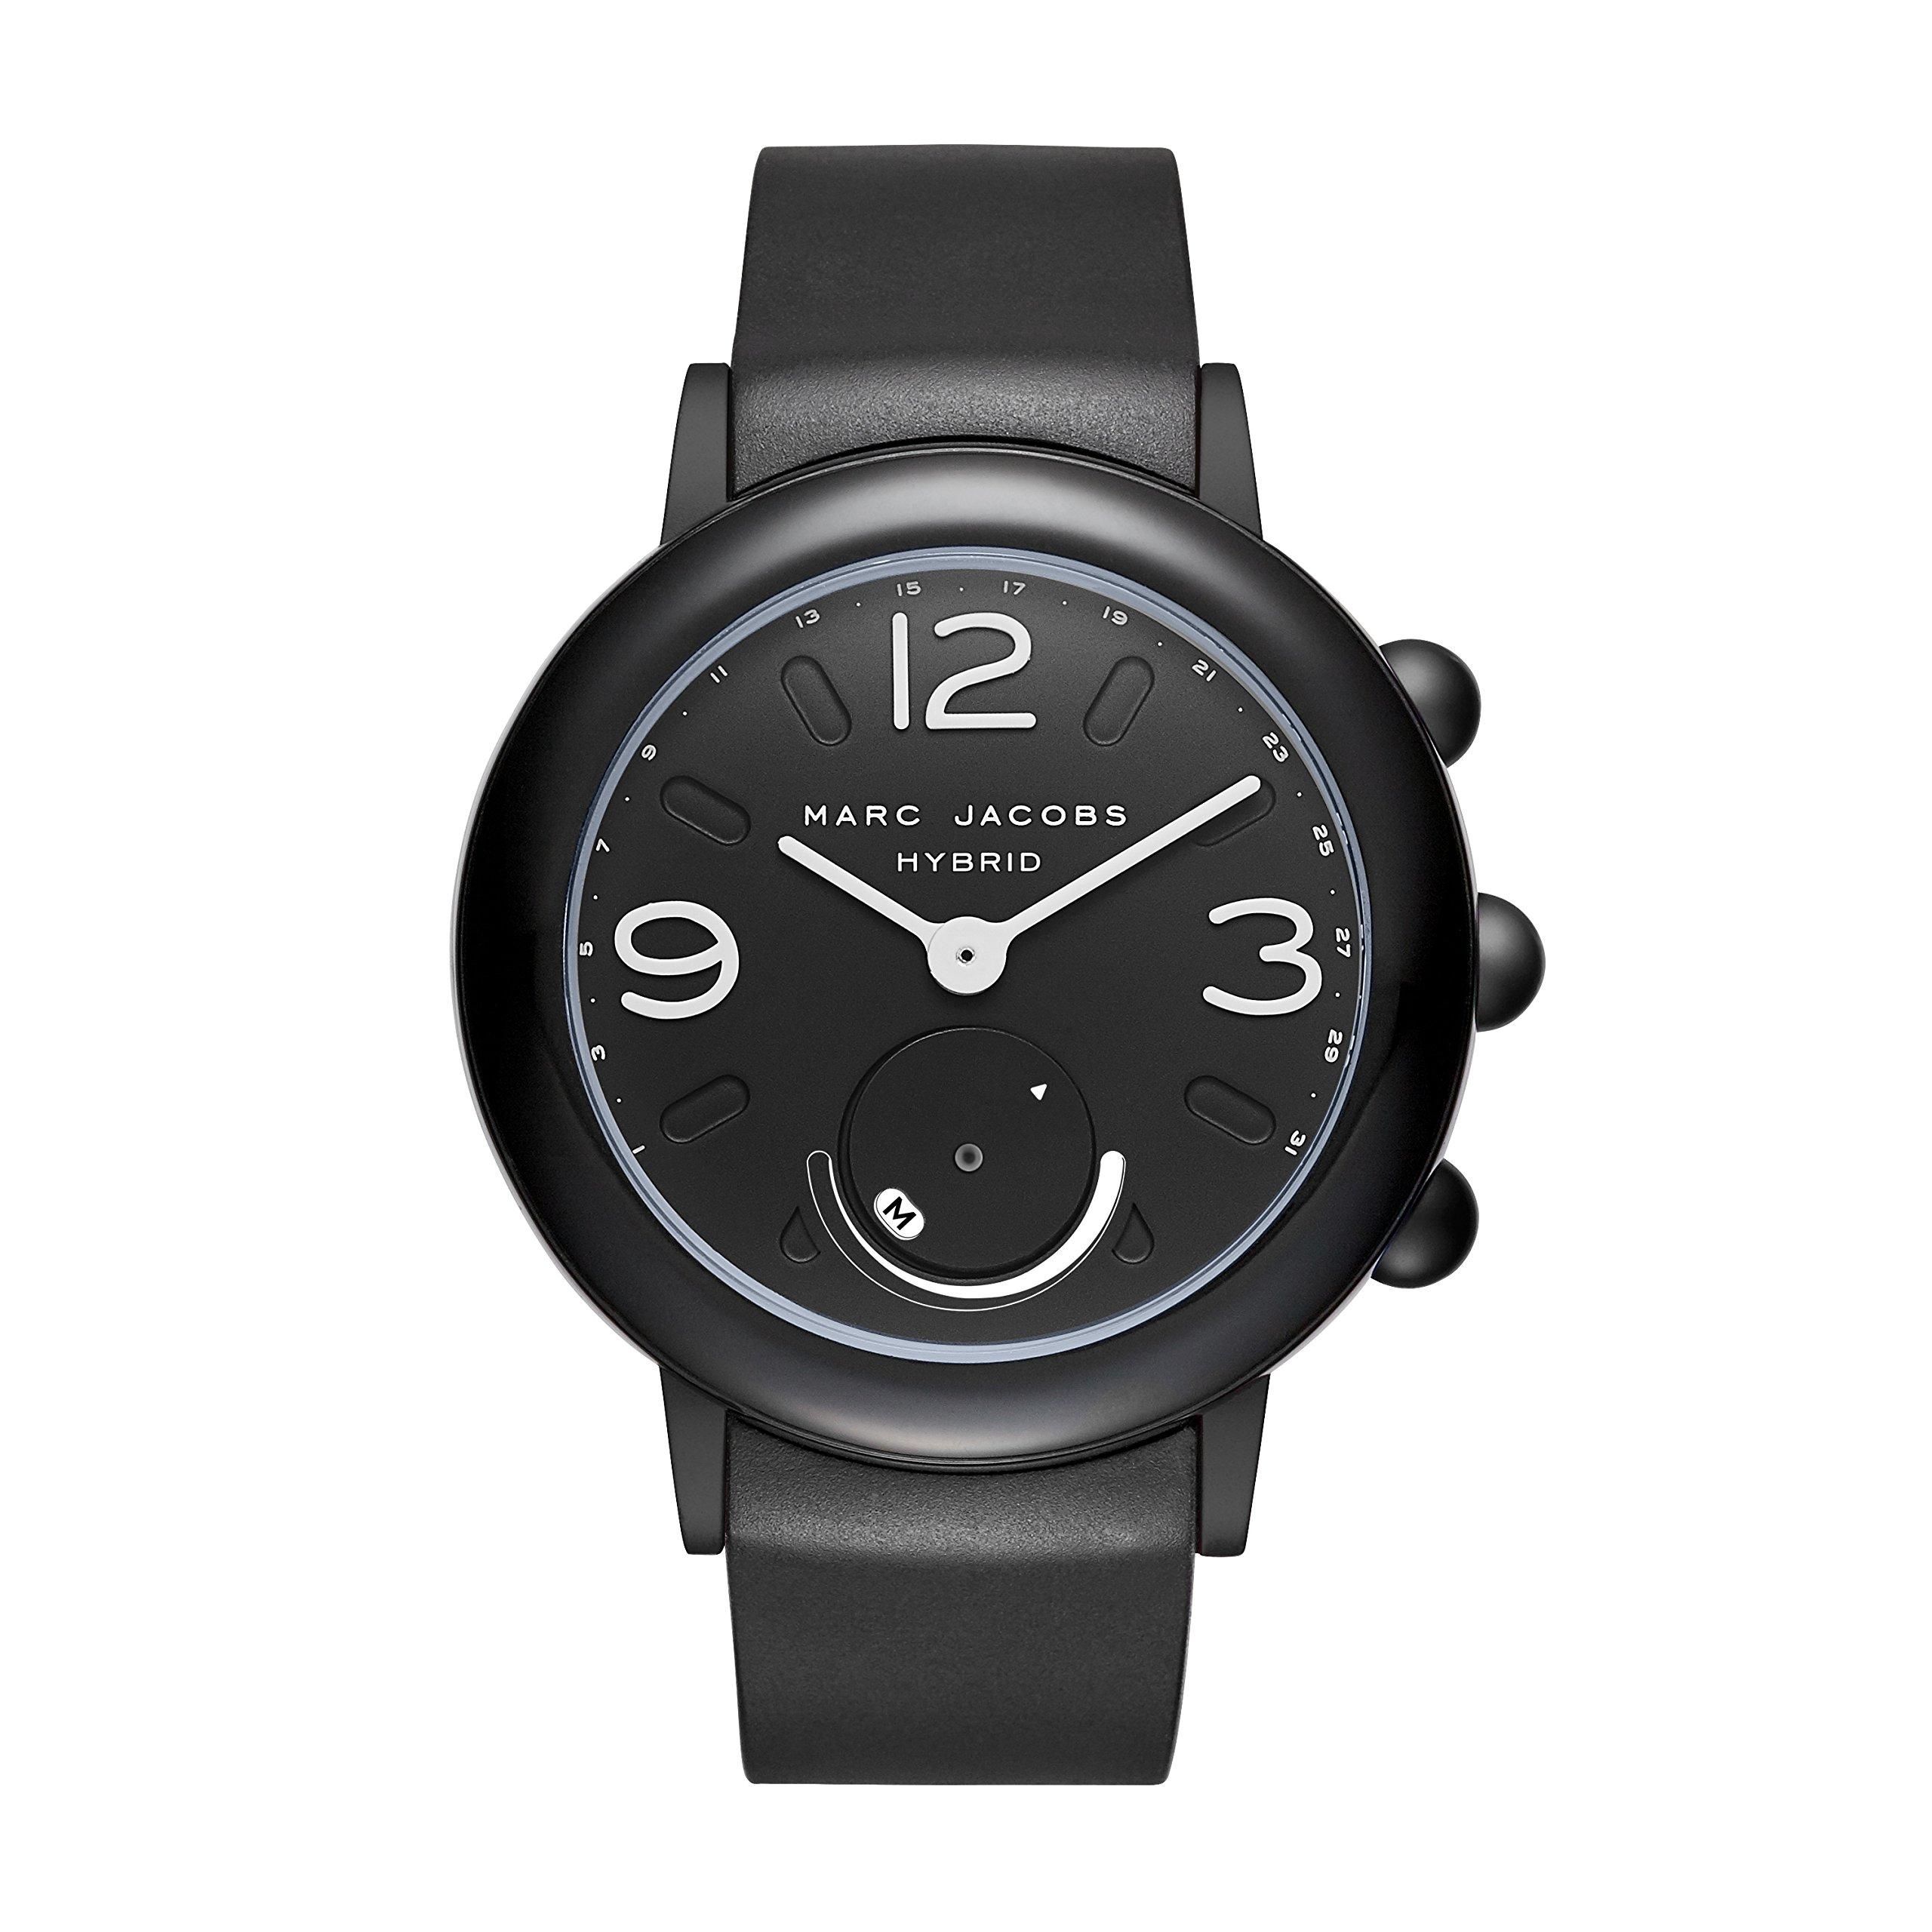 Marc Jacobs Women's Riley Aluminum and Rubber Hybrid Smartwatch, Color: Black (MJT1002) by Marc Jacobs